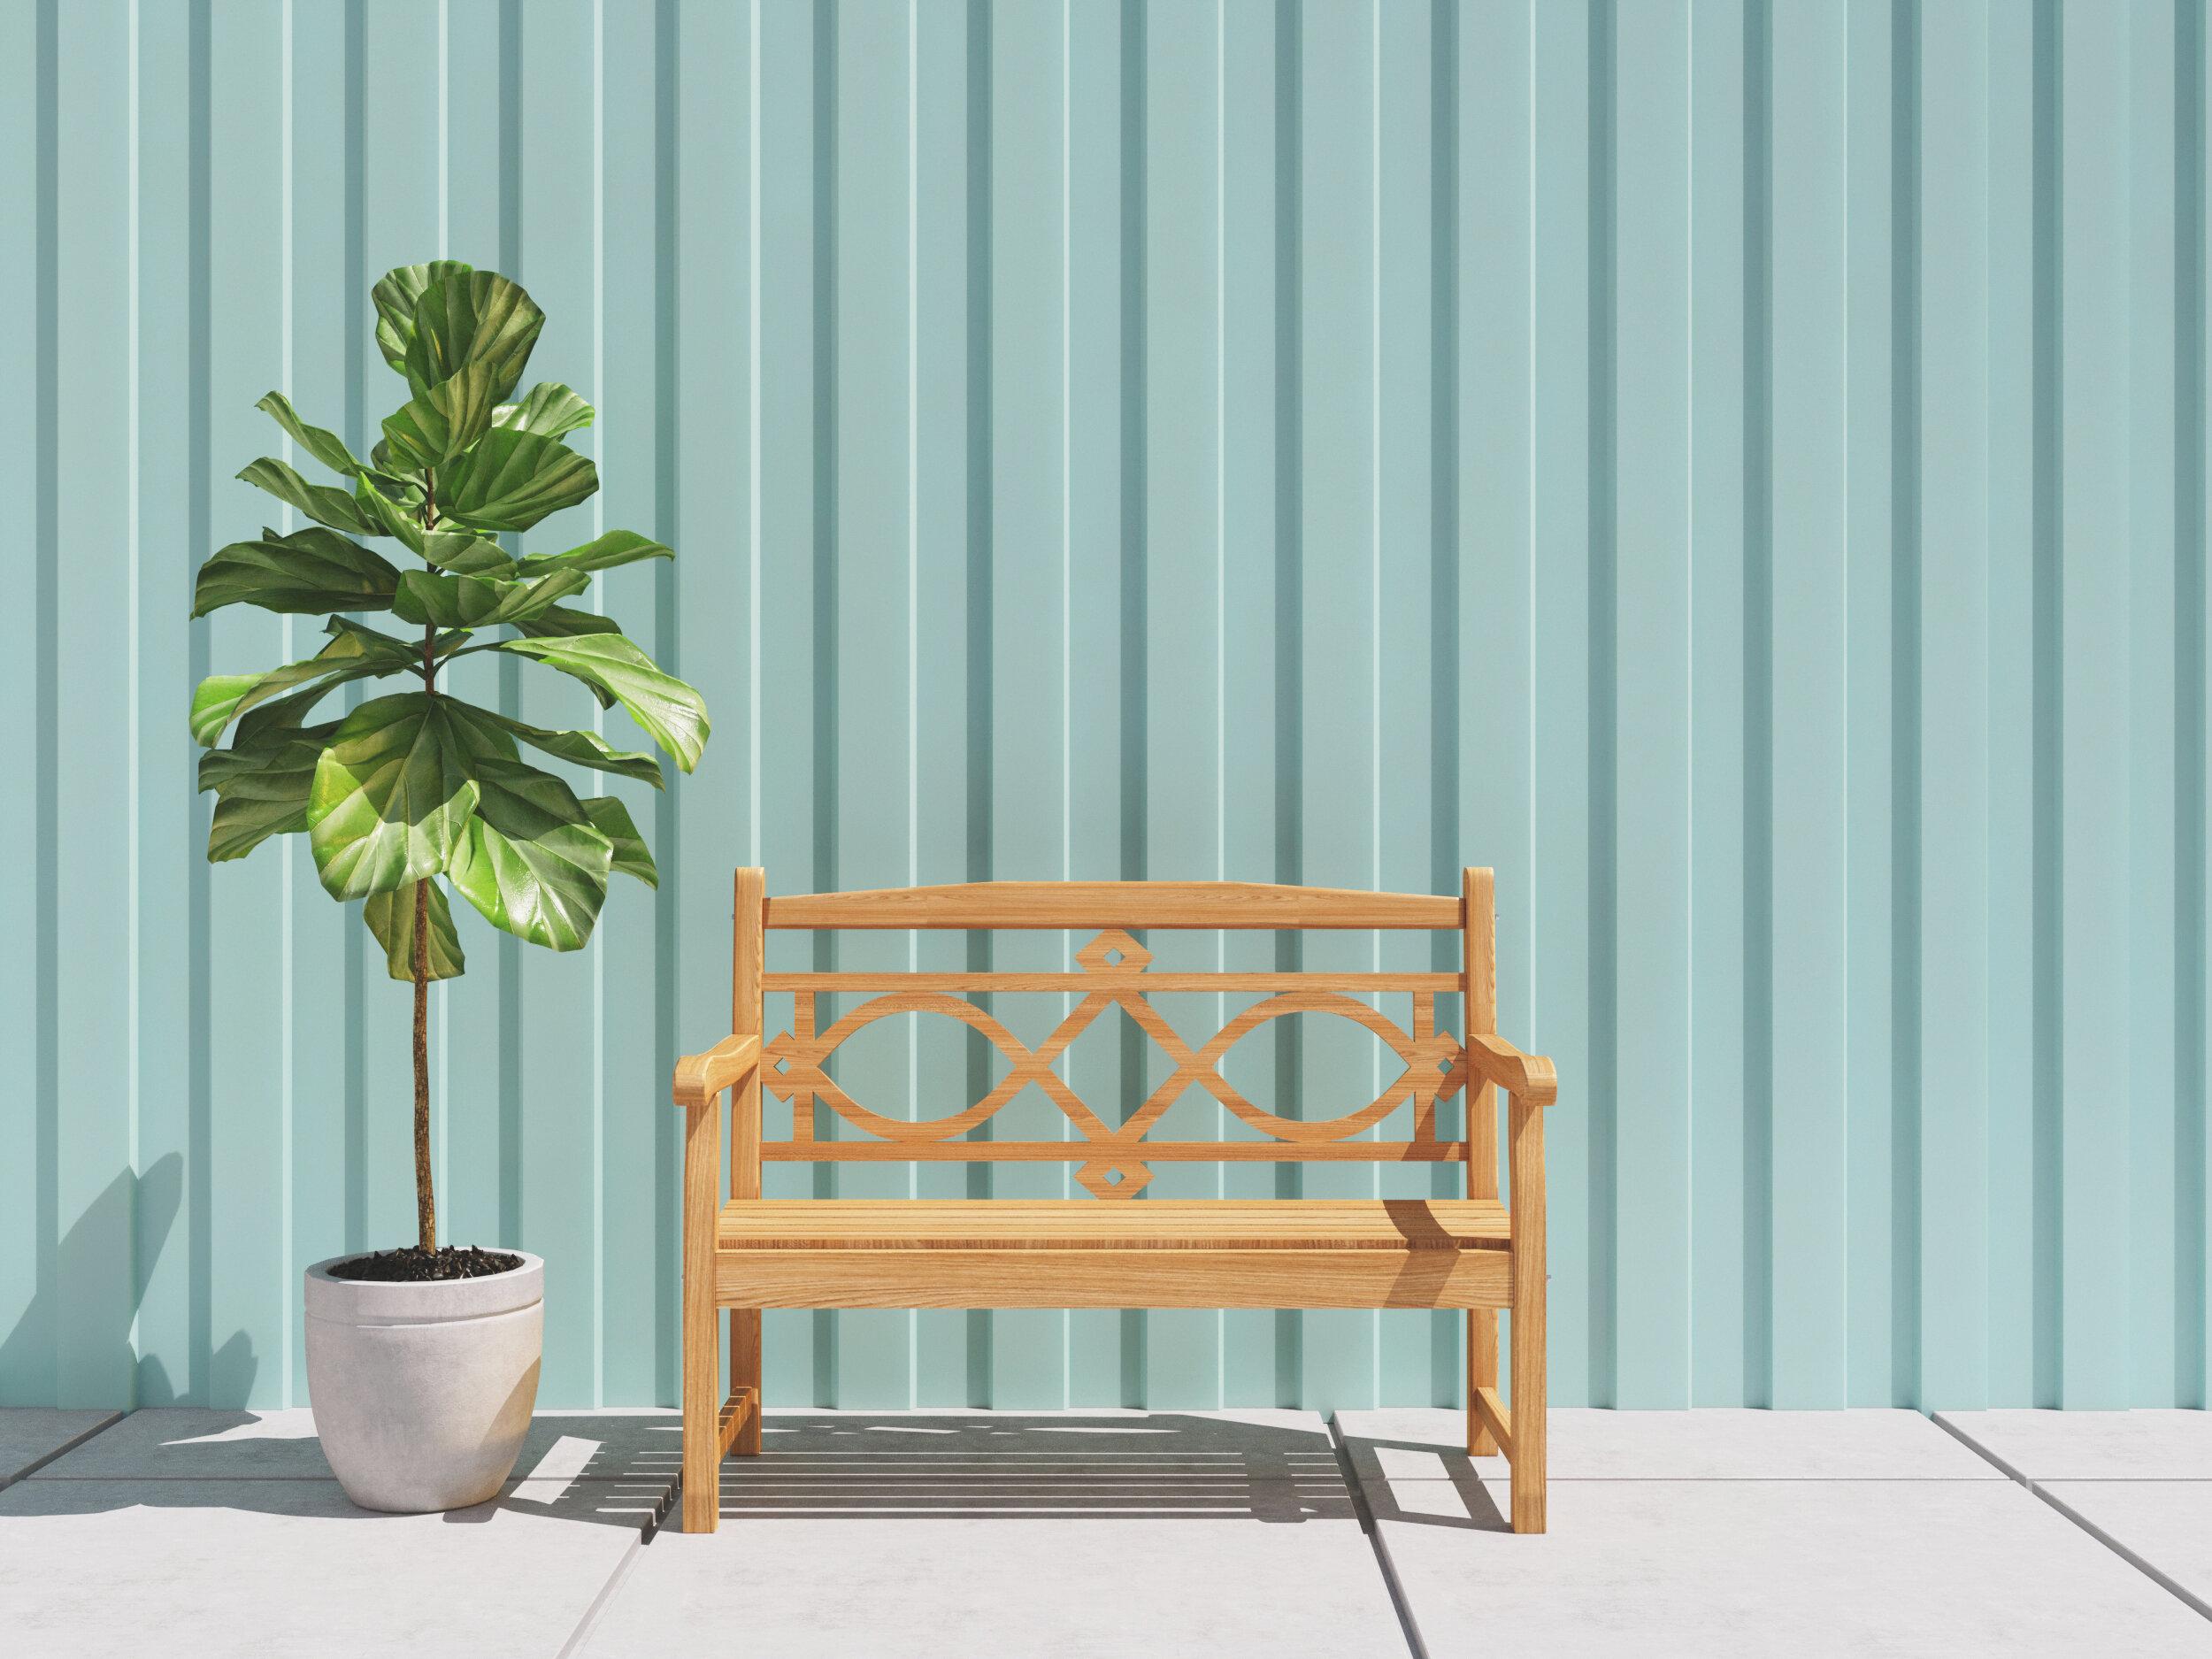 Teak Garden Bench With Regard To Alfon Wood Garden Benches (View 8 of 25)